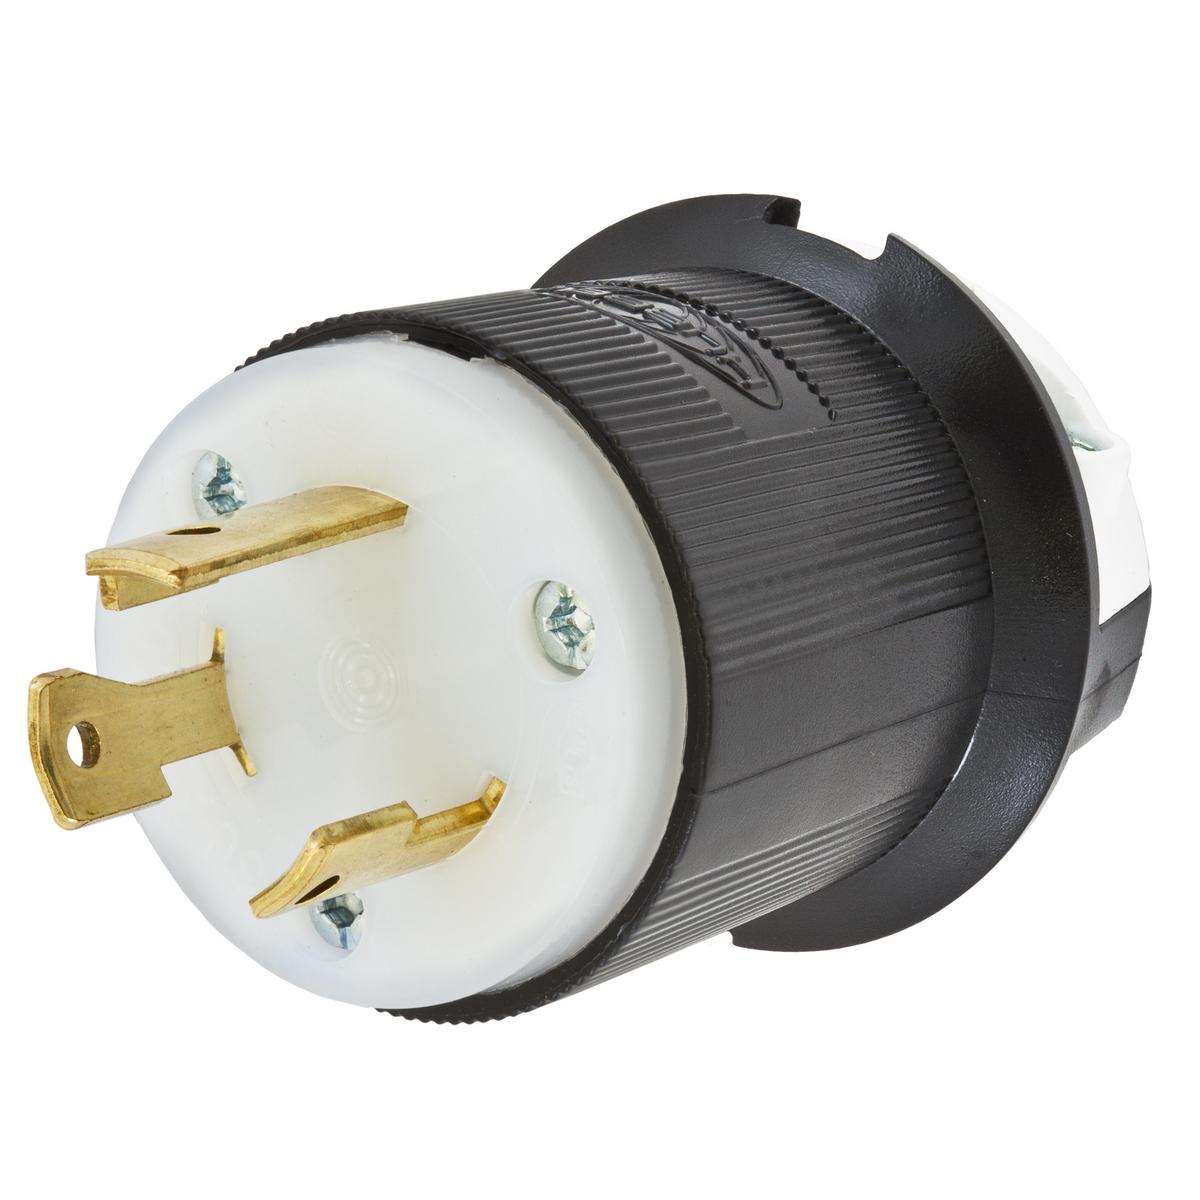 Hubbell Inc Hbl2611 Twist Lock Plug L5 30p 2 Pole 30 Amp 125 Wiring Ac Volt Black White